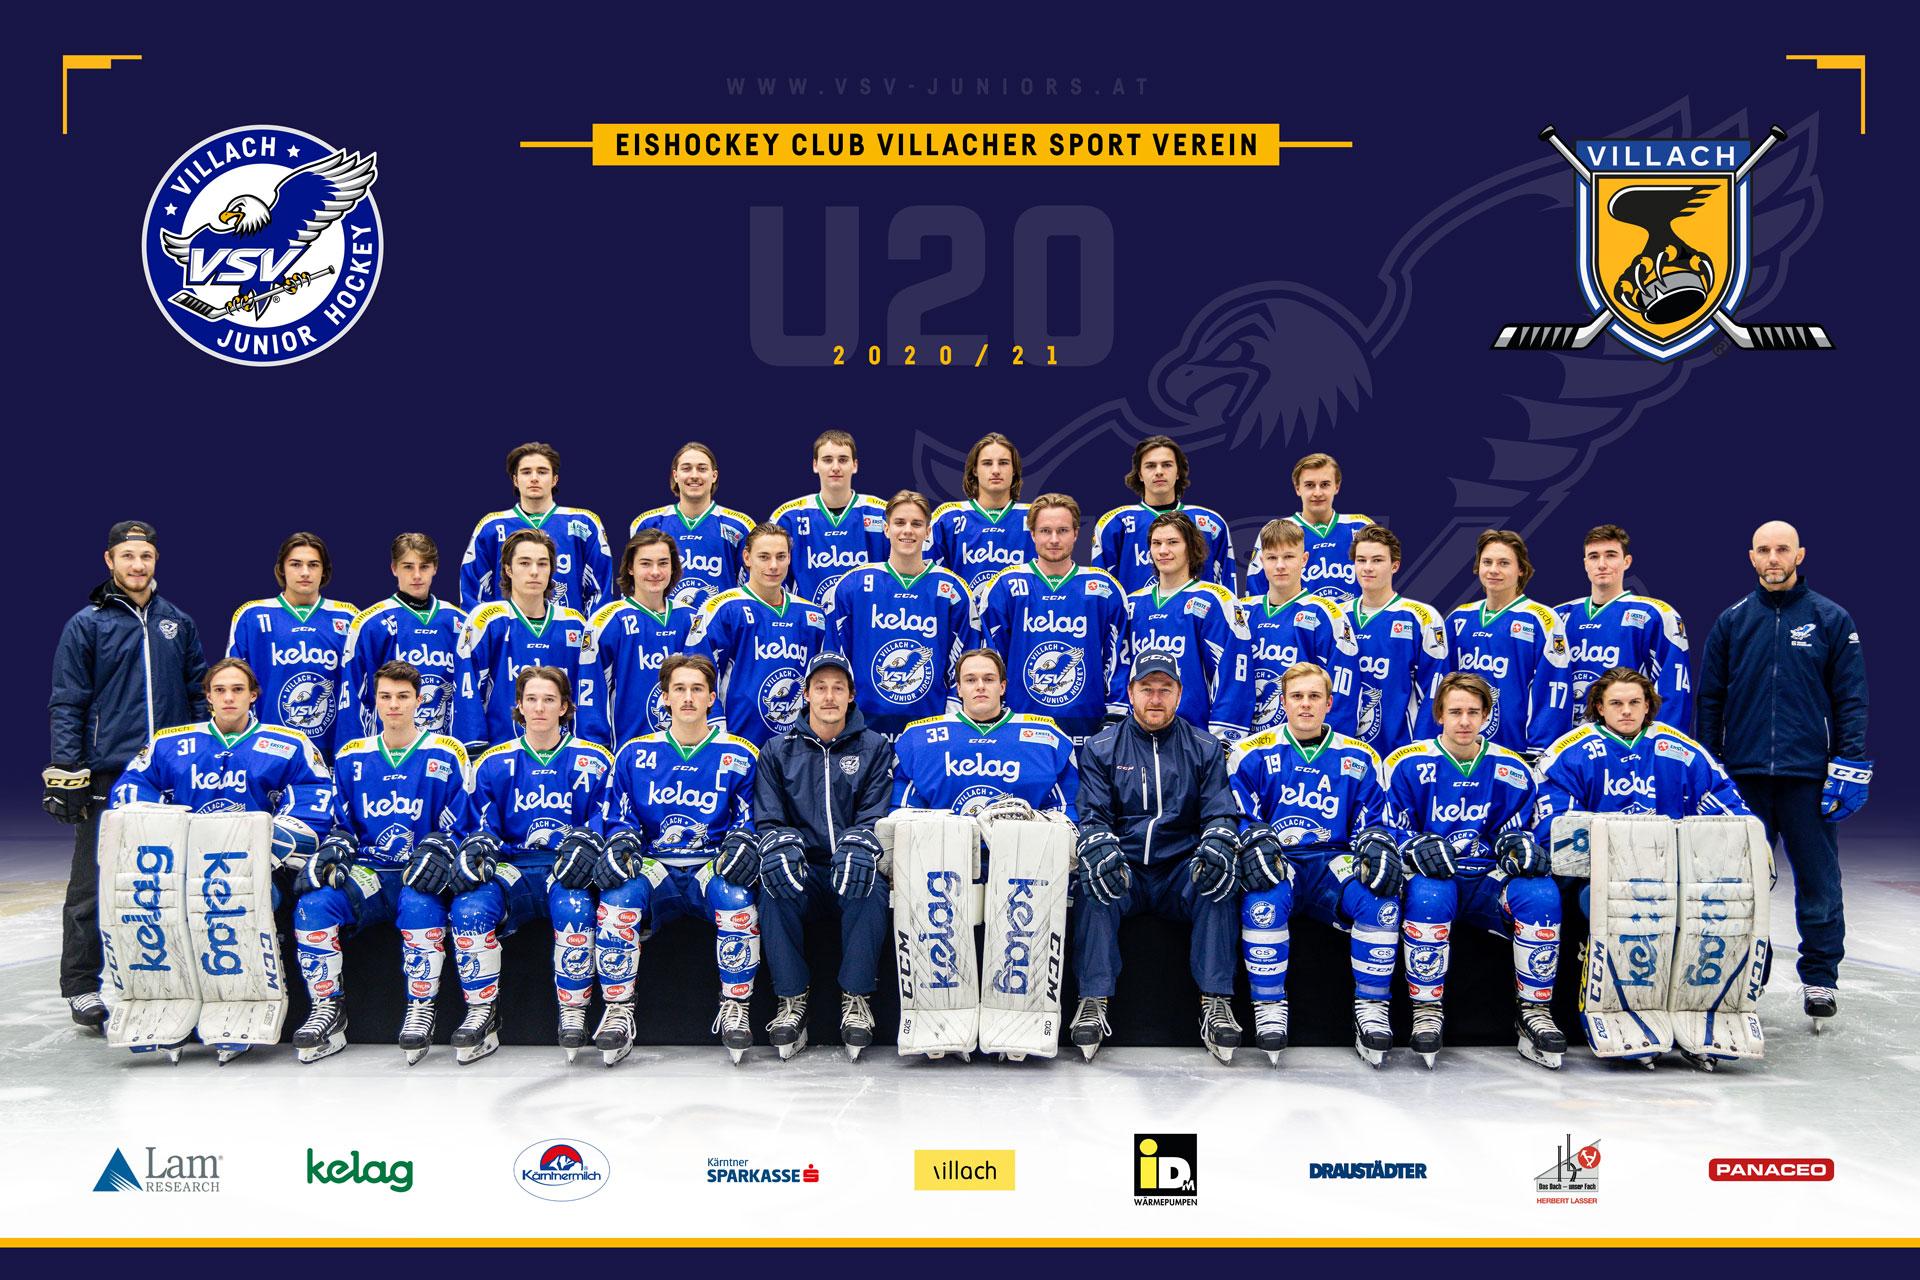 EC VSV U20 2020-21